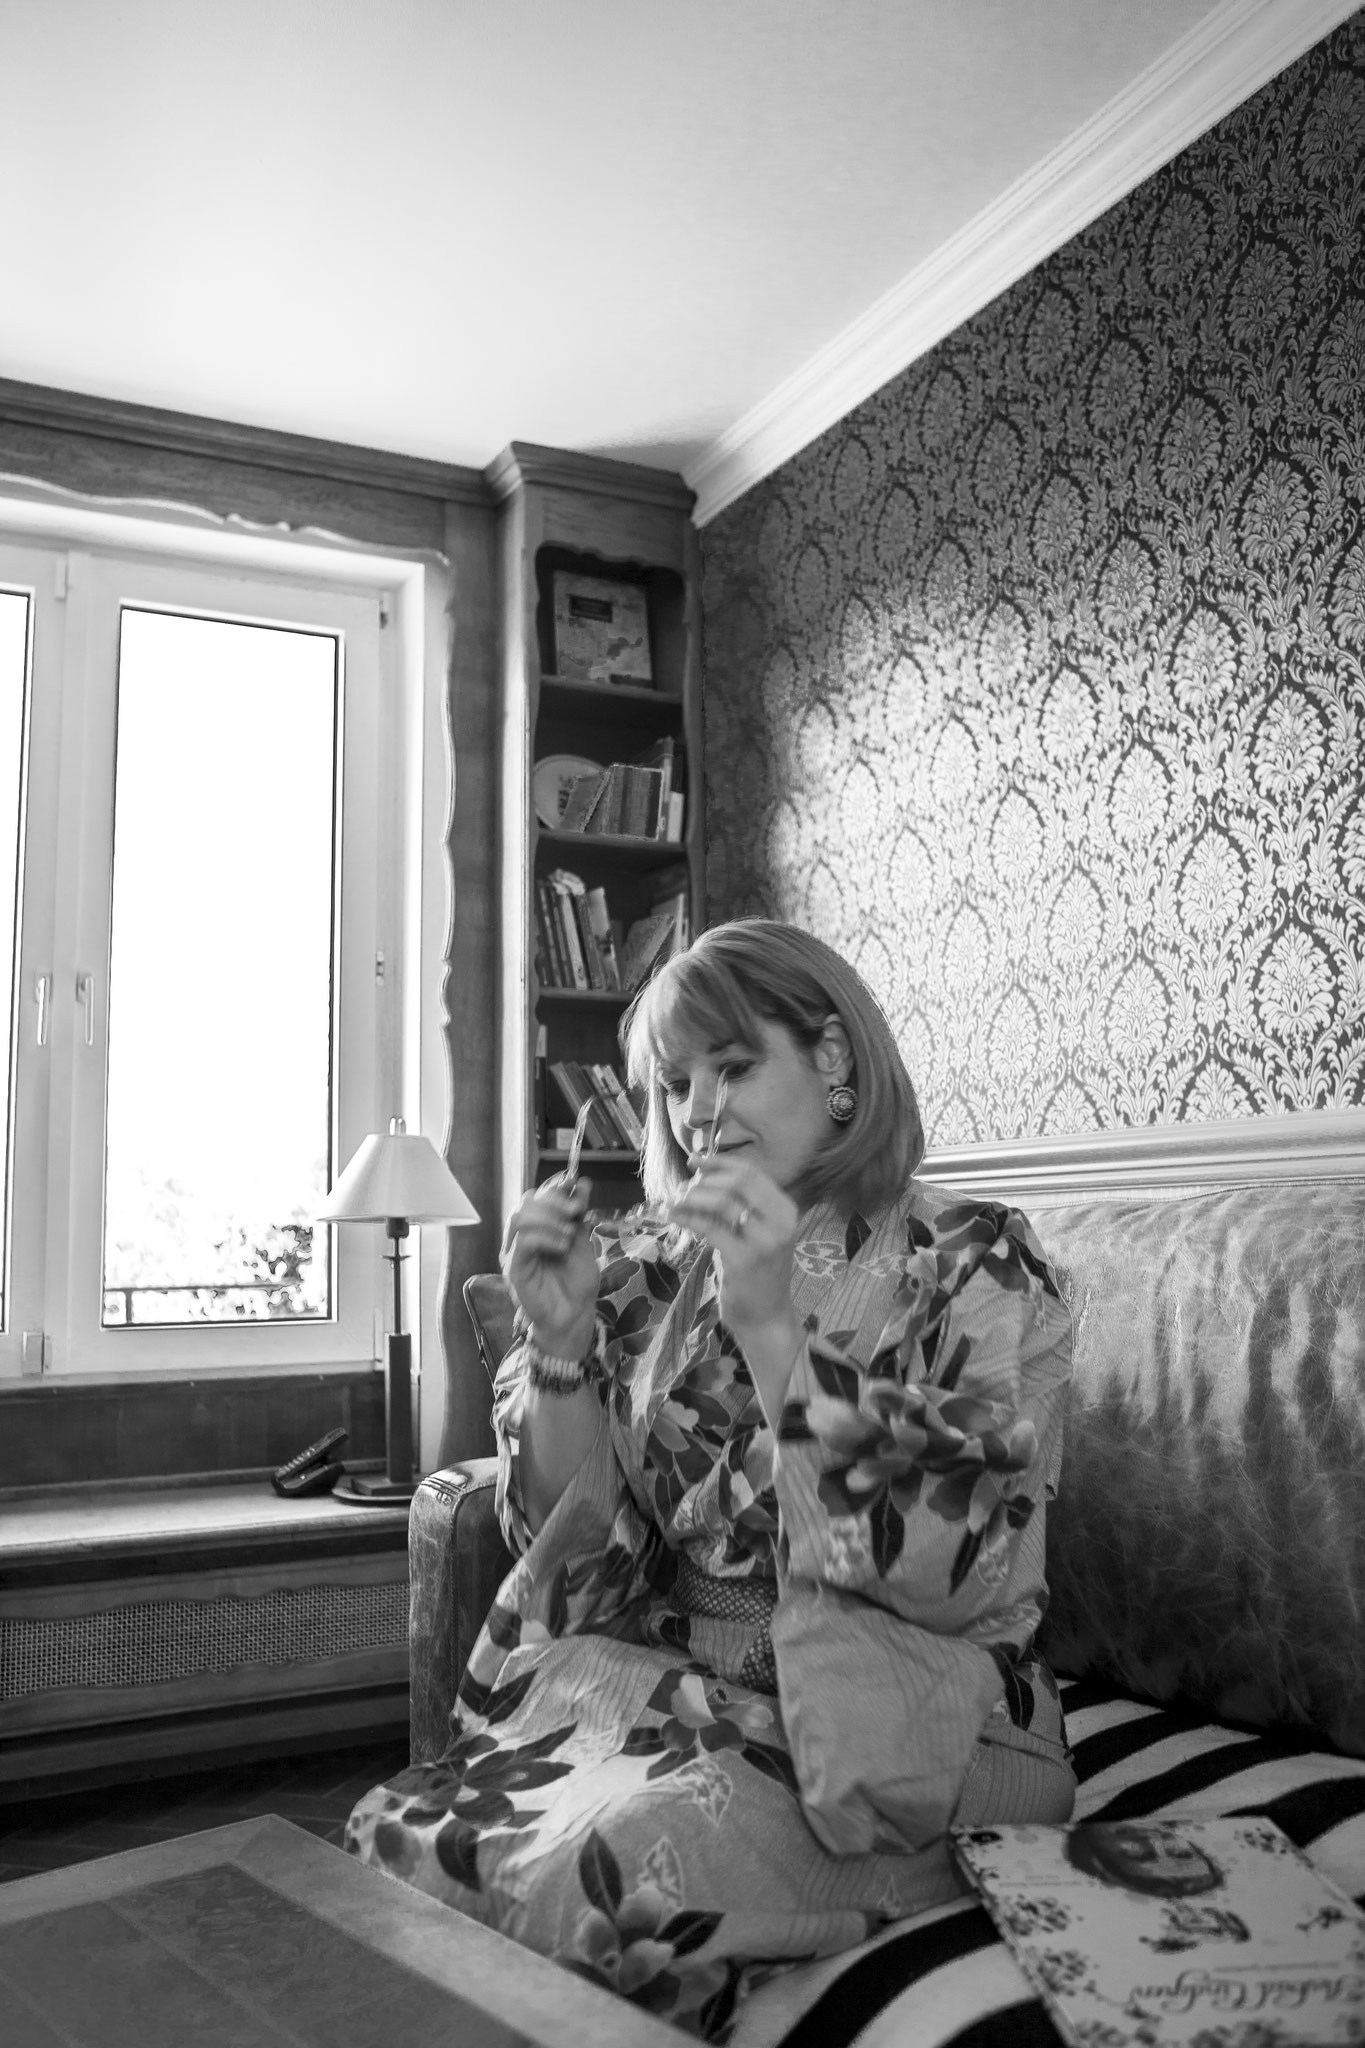 Cathy Clement / Foto: Aruna Huss